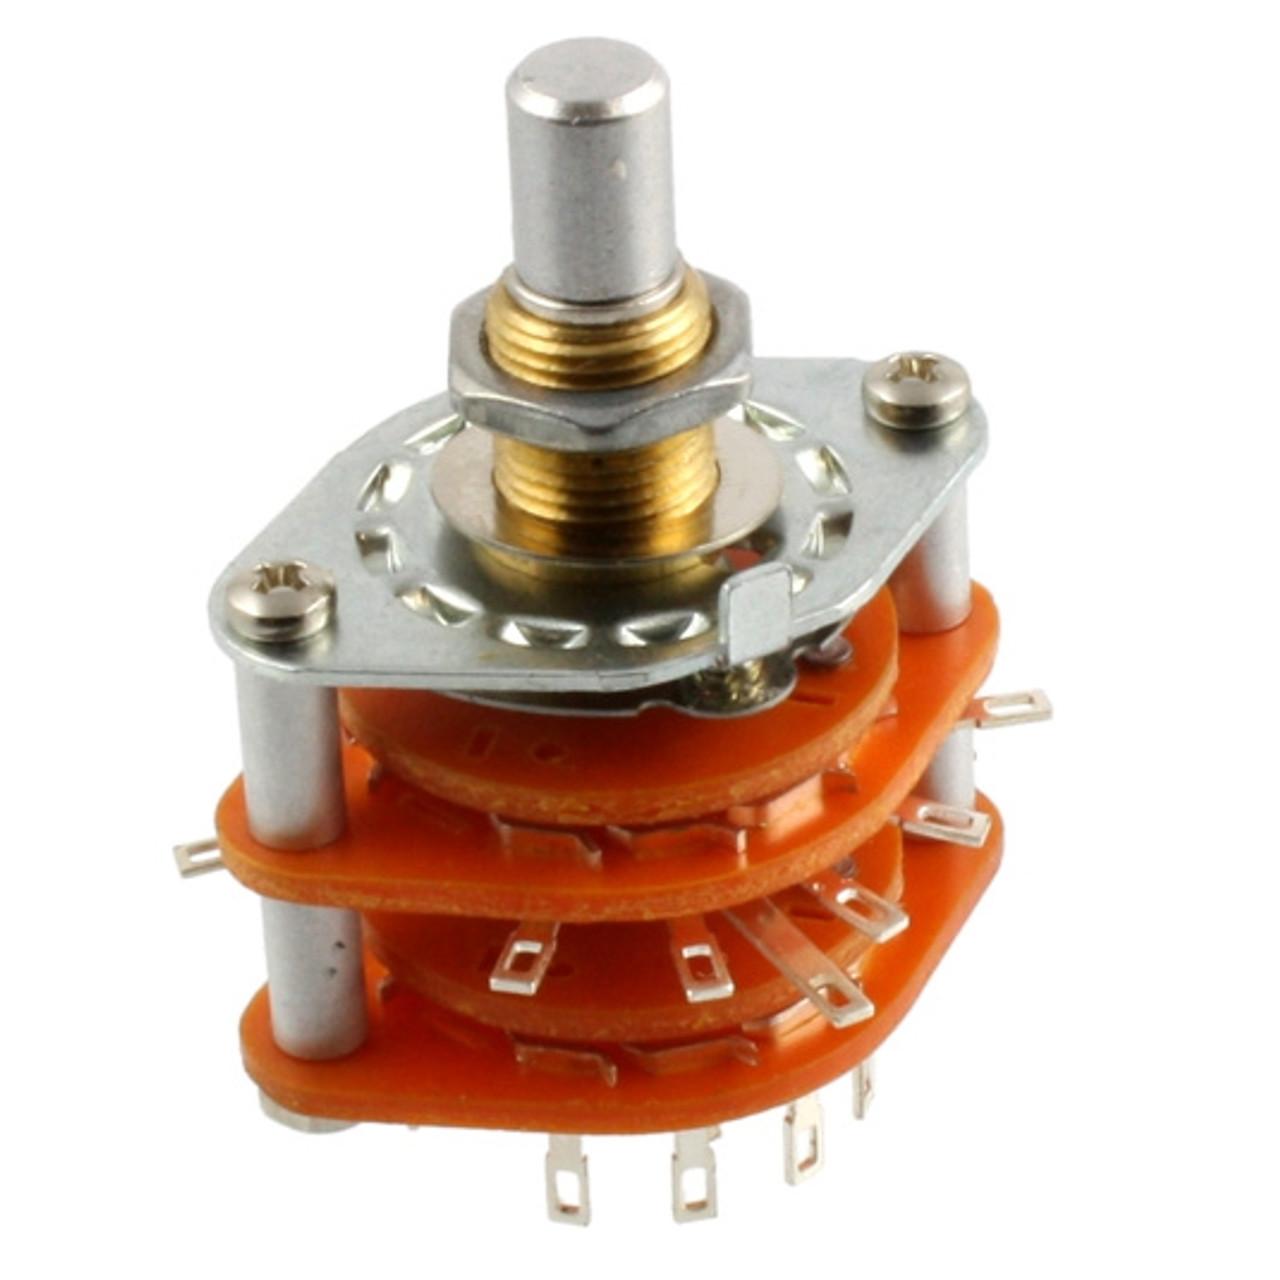 6-Way Rotary Pickup Selector Switch